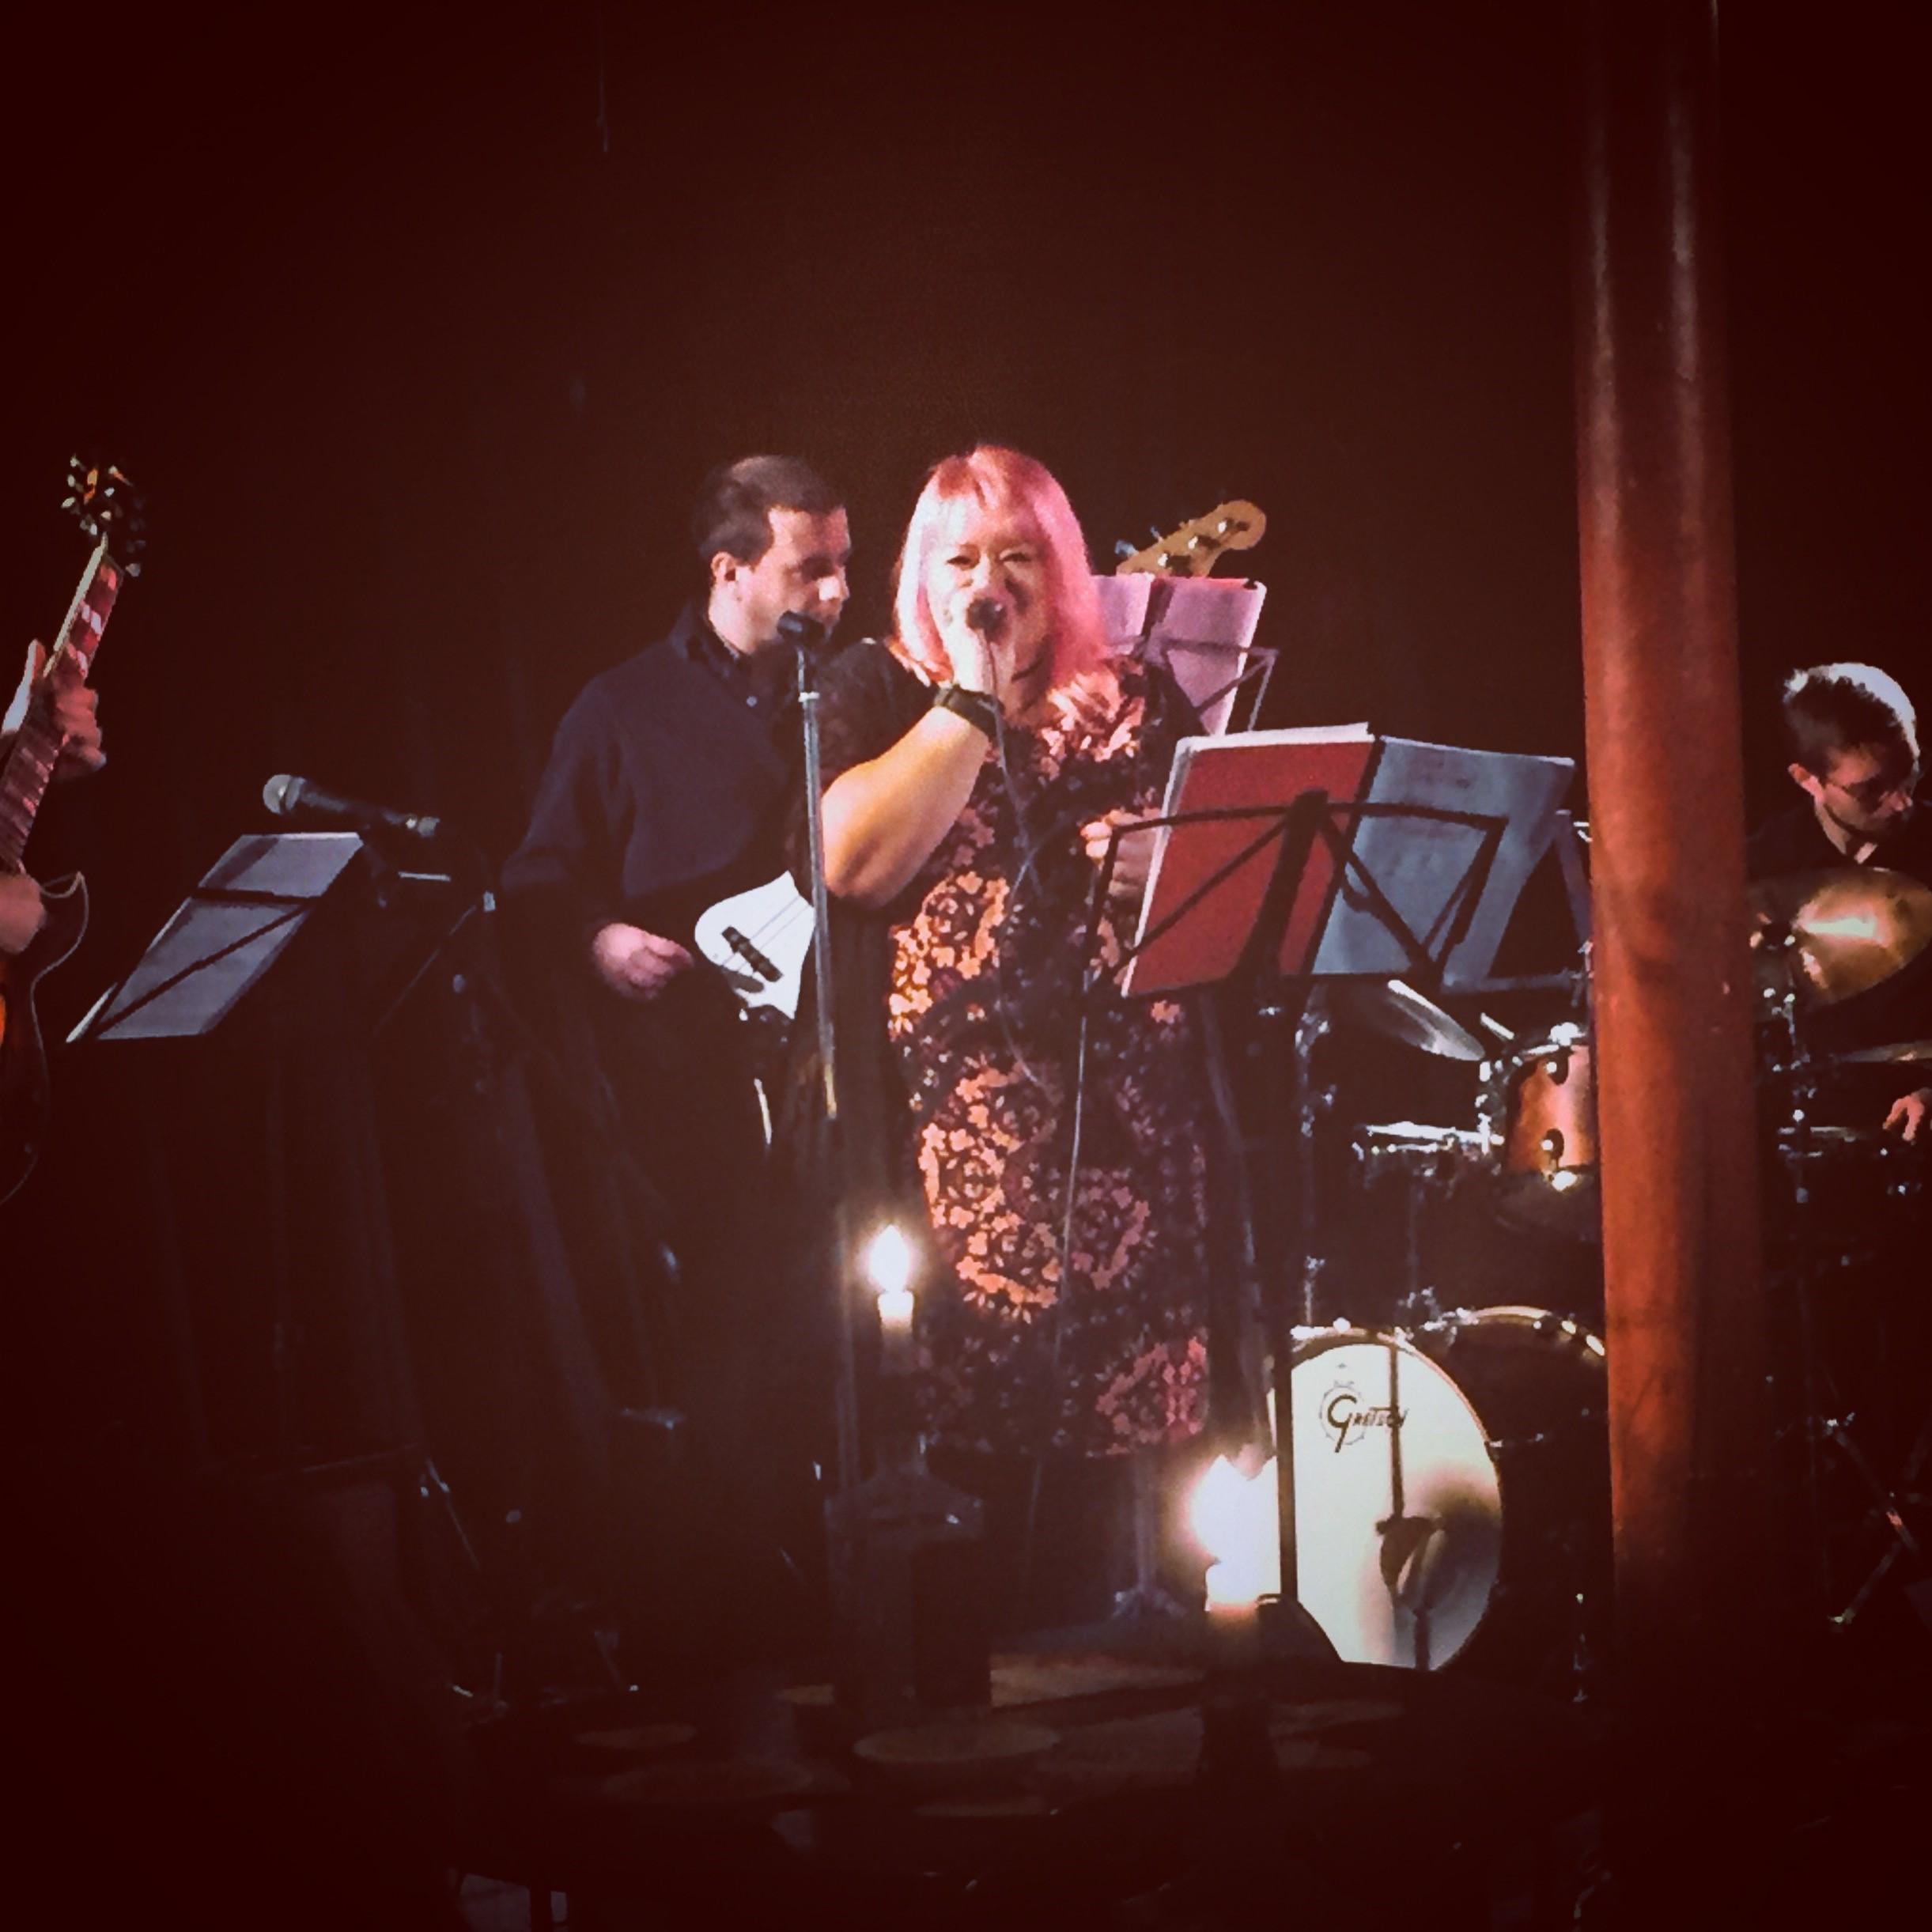 Elaine Crighton Jazz Singer